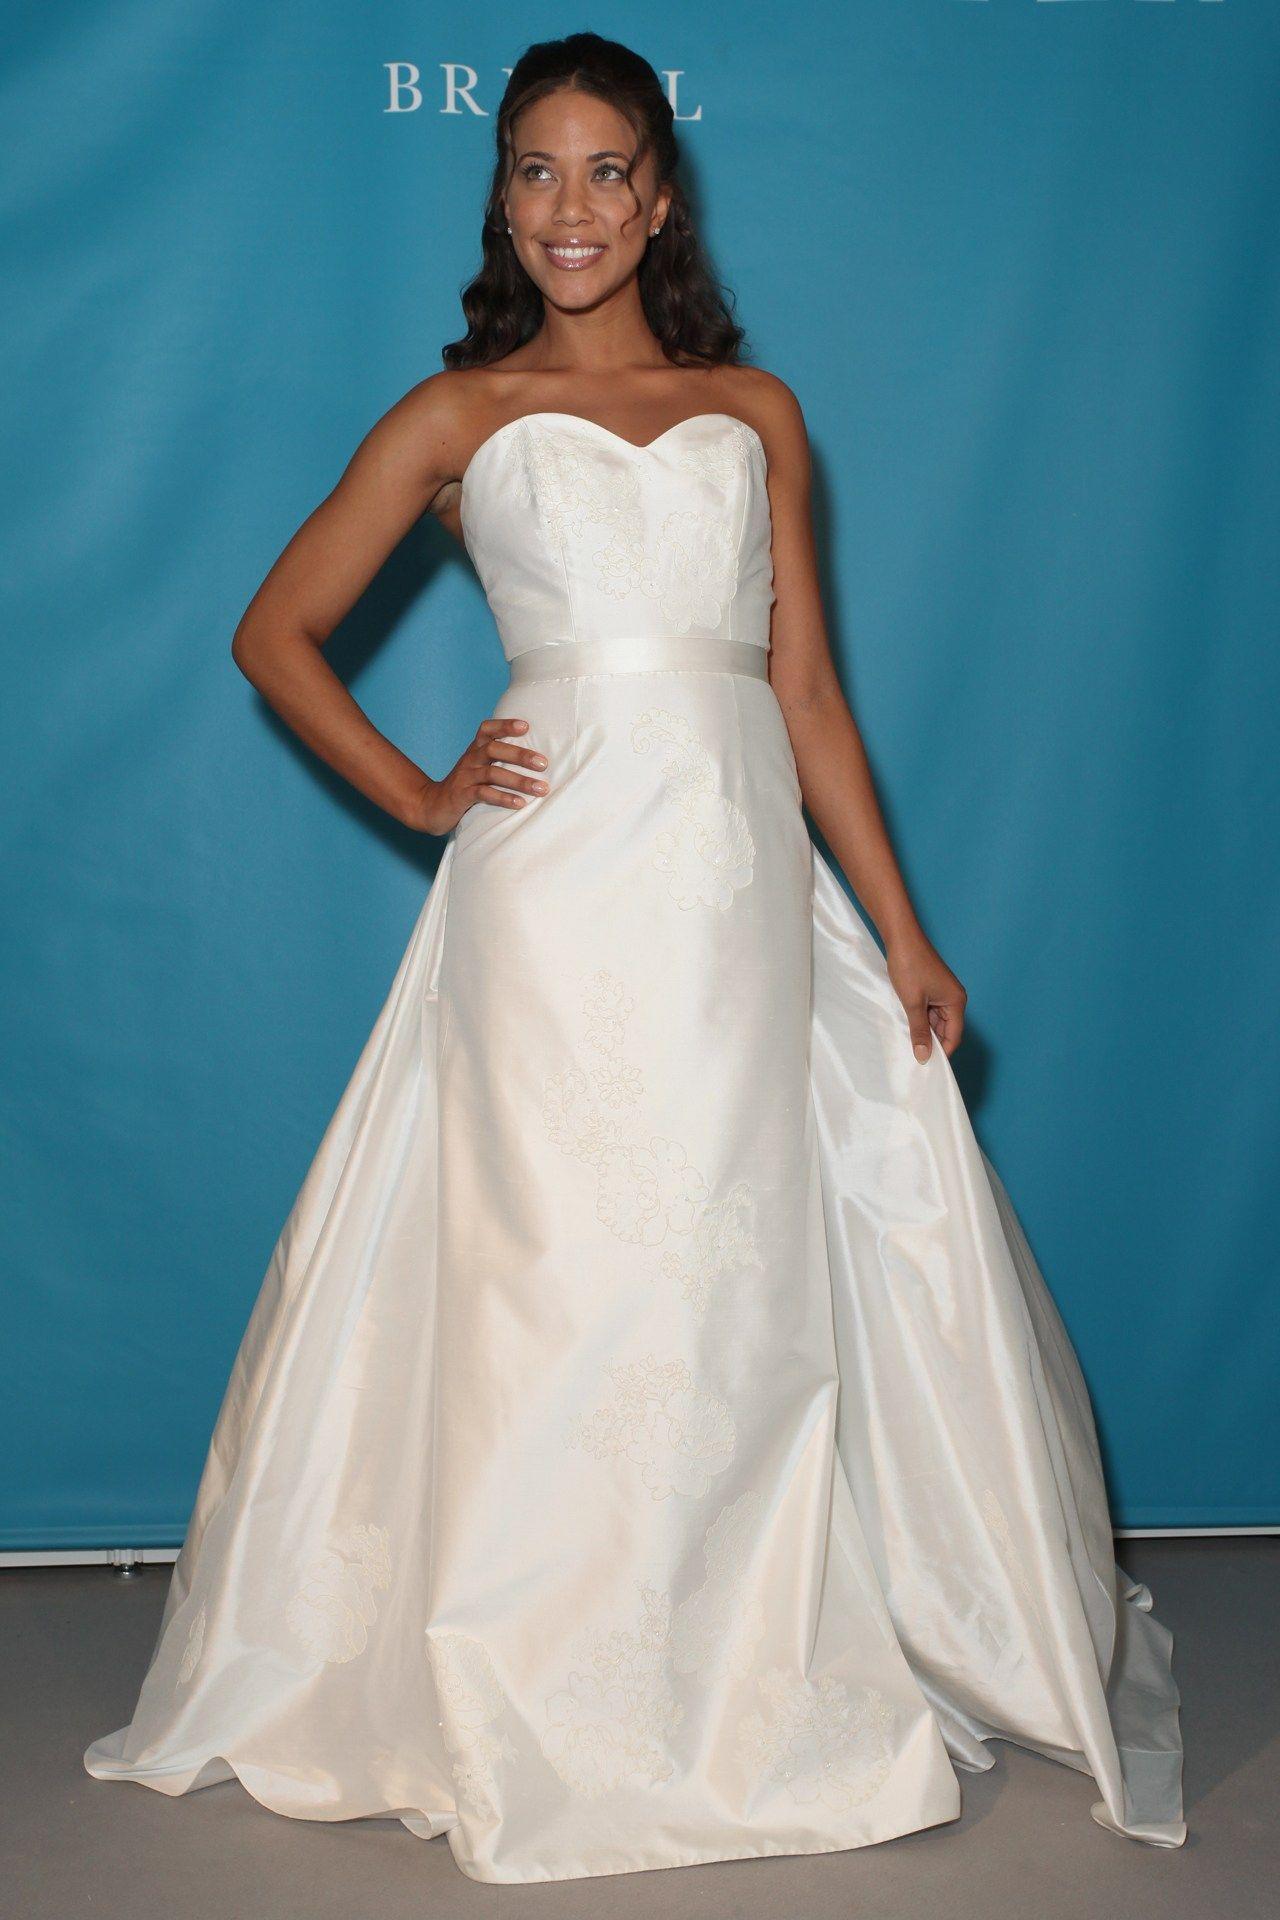 Luxury Medieval Corset Wedding Dresses Pattern - All Wedding Dresses ...